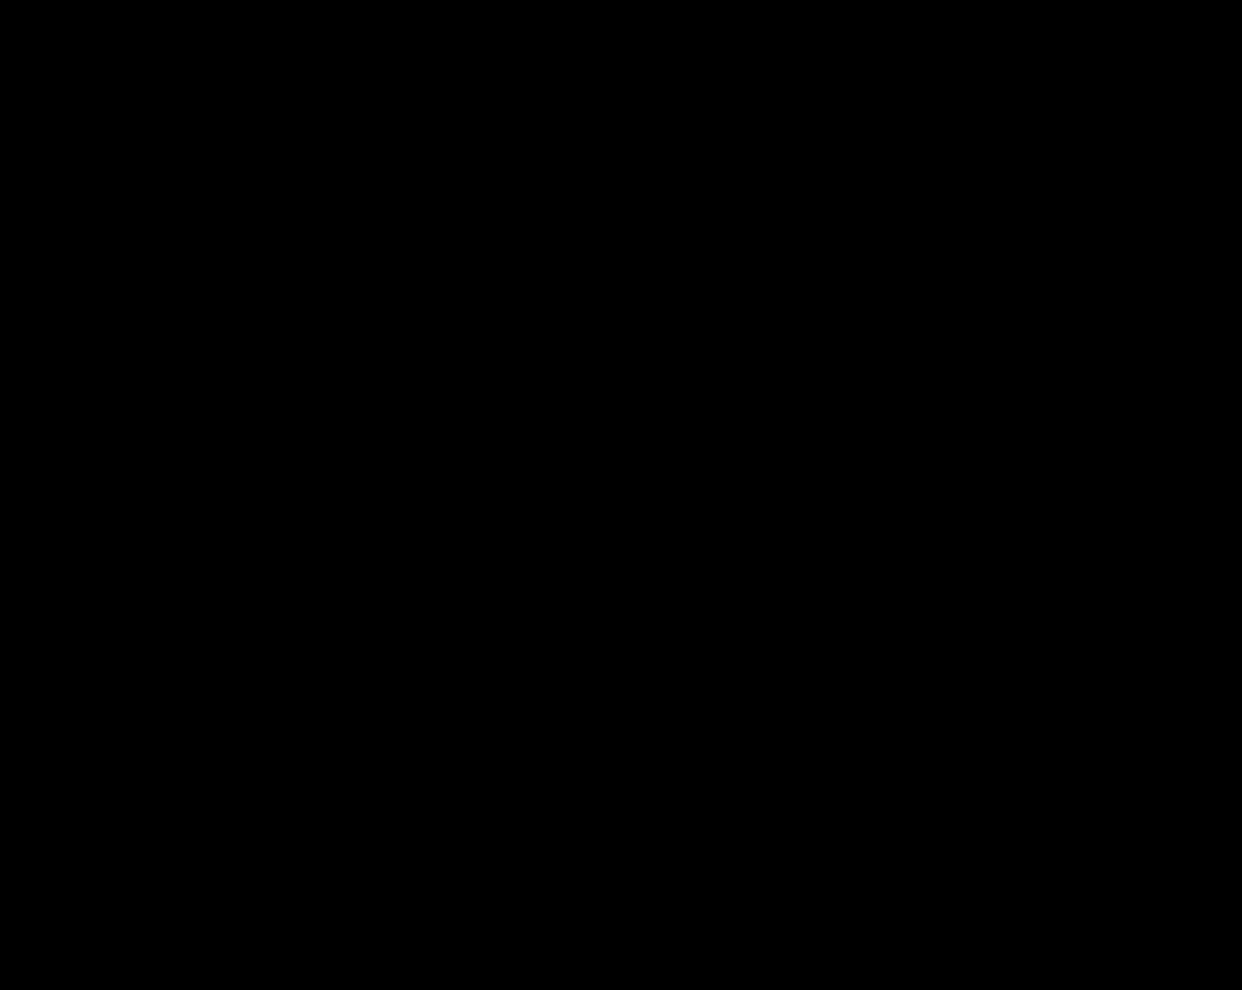 72D08856-0E0B-4C61-BC81-6524AB7659A4.jpeg